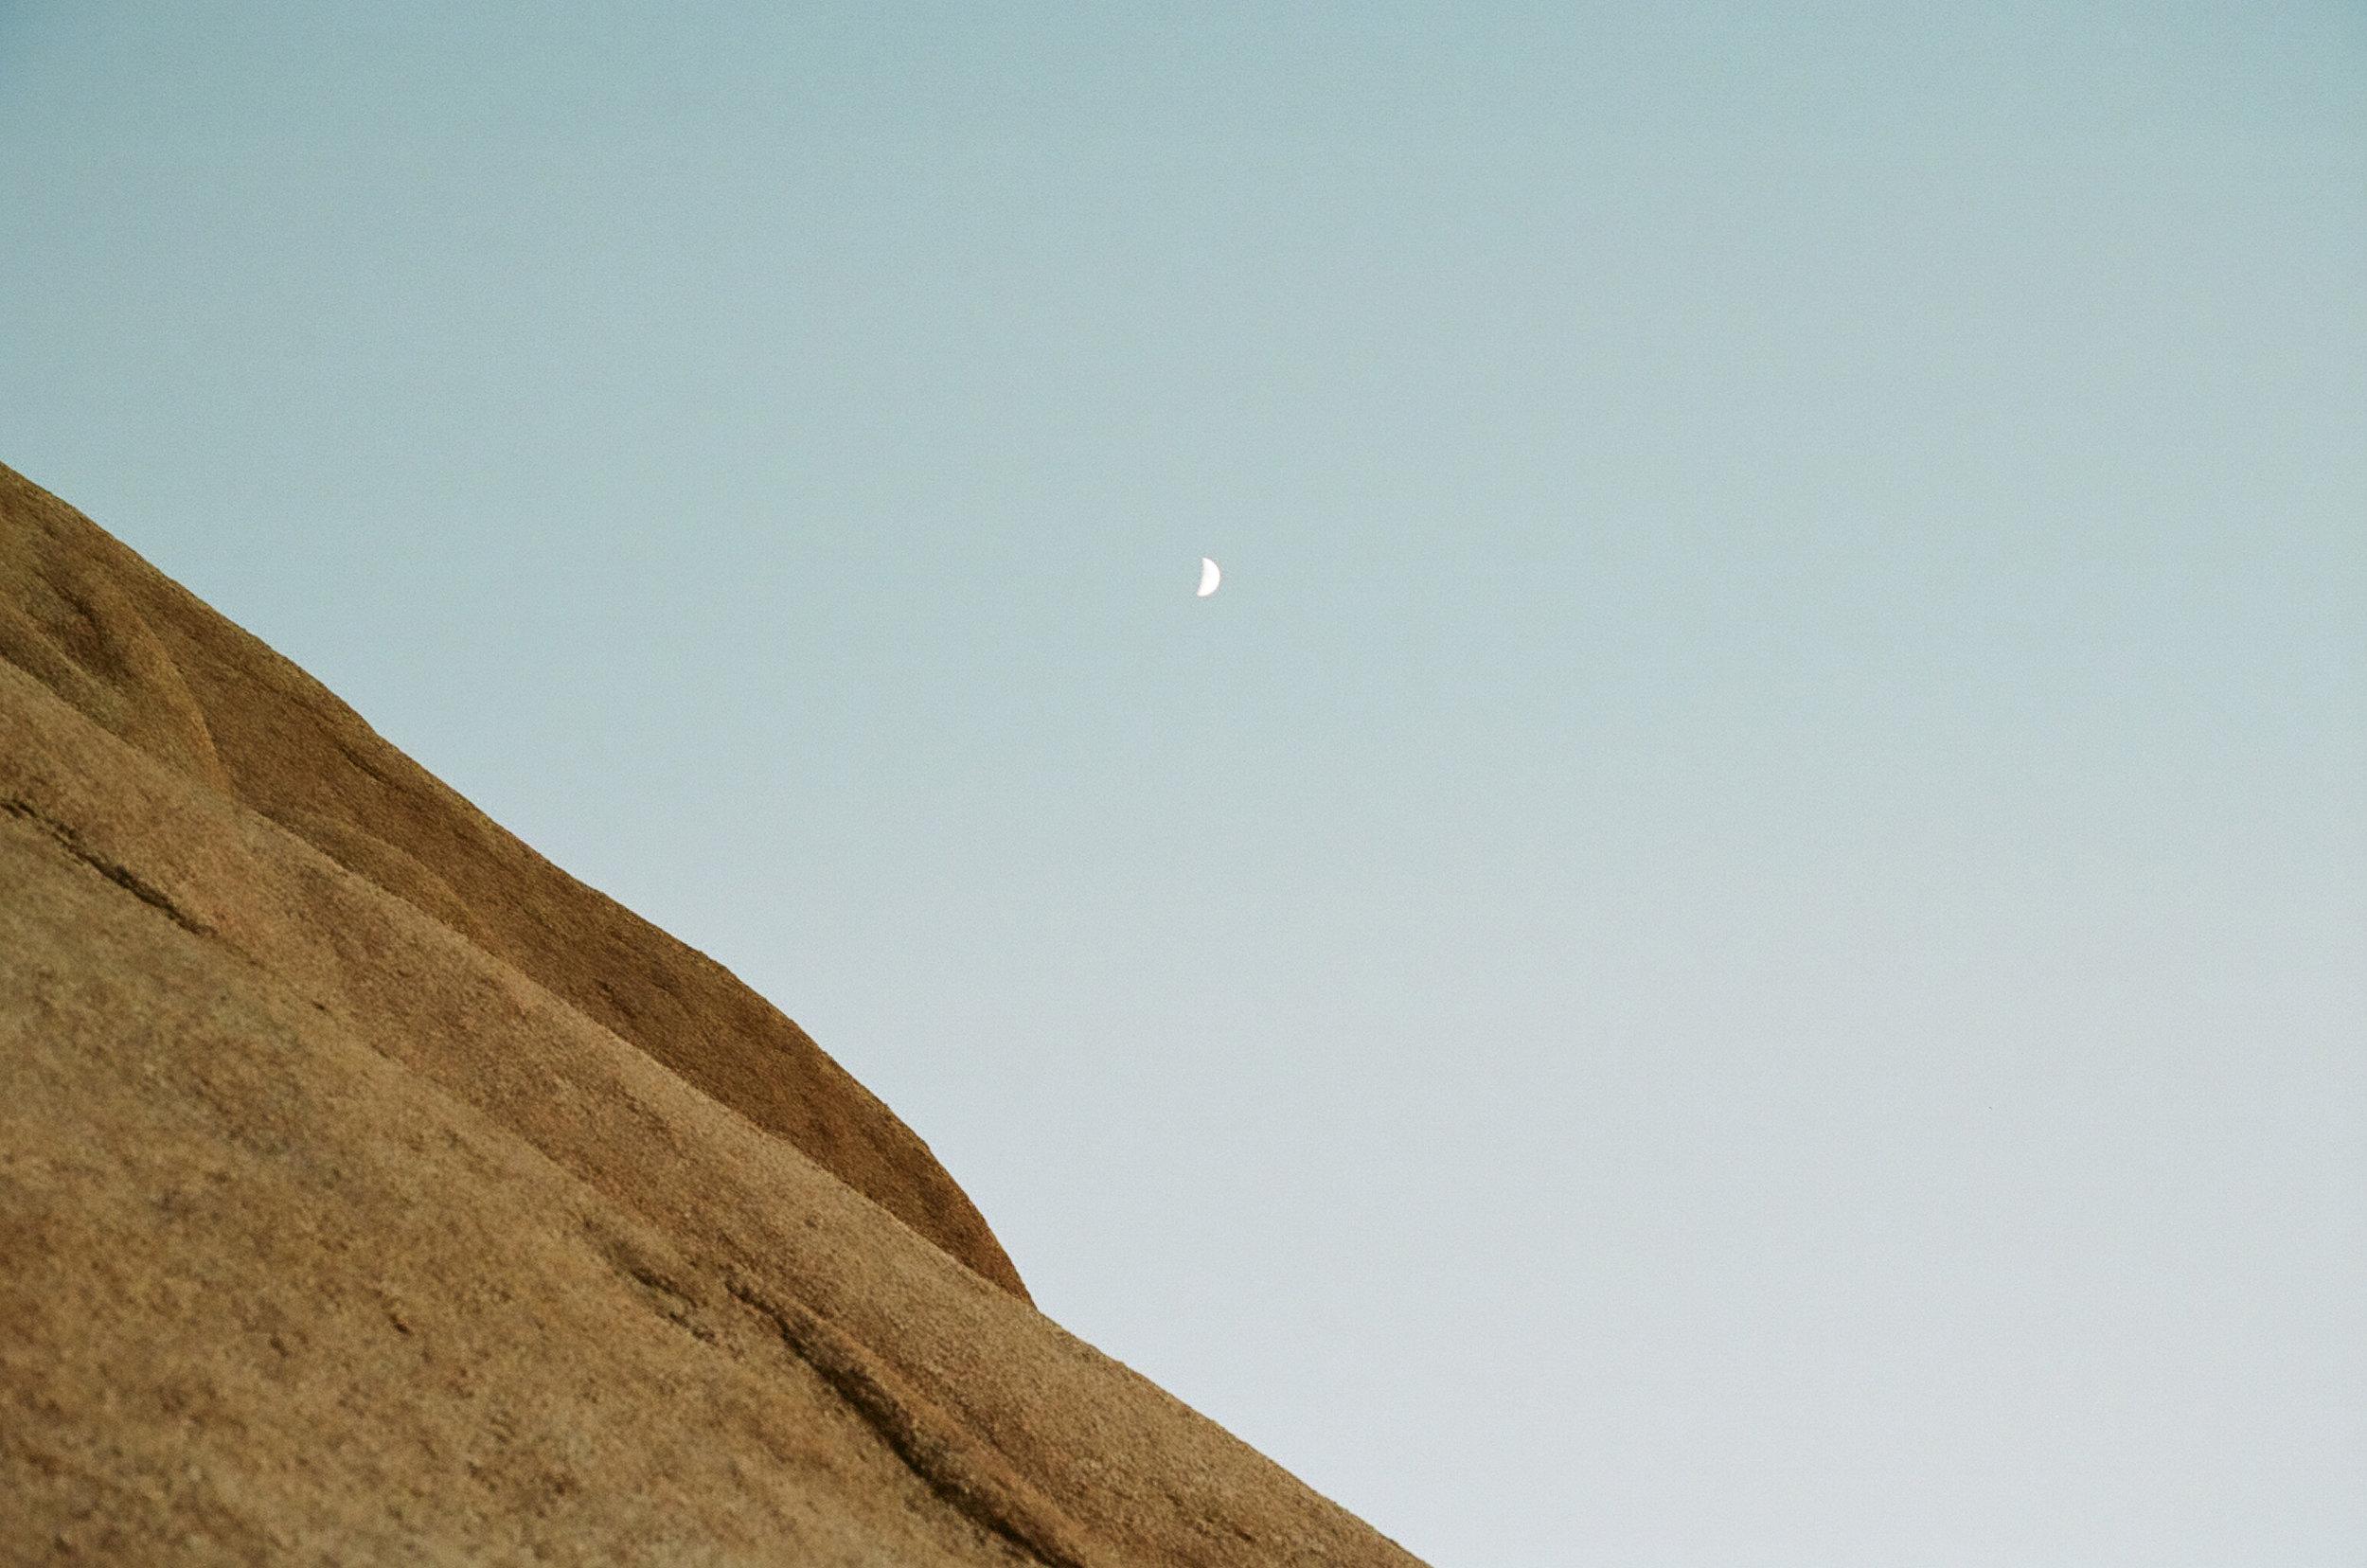 dusk-moon-joshua-tree-cameliamanea.jpg